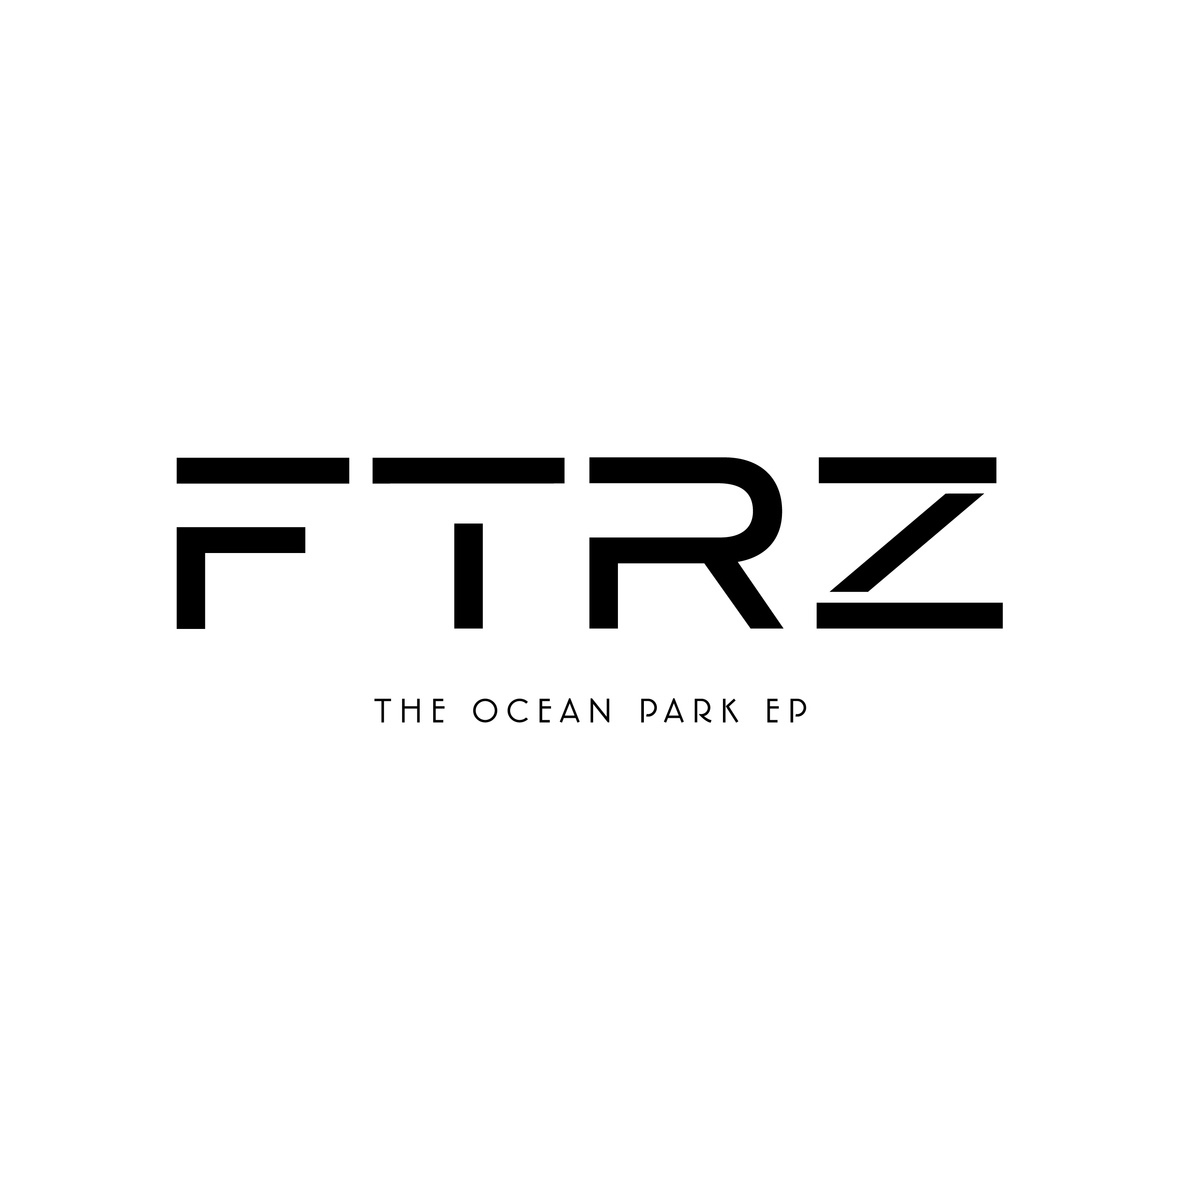 ftrz the ocean park ep cover